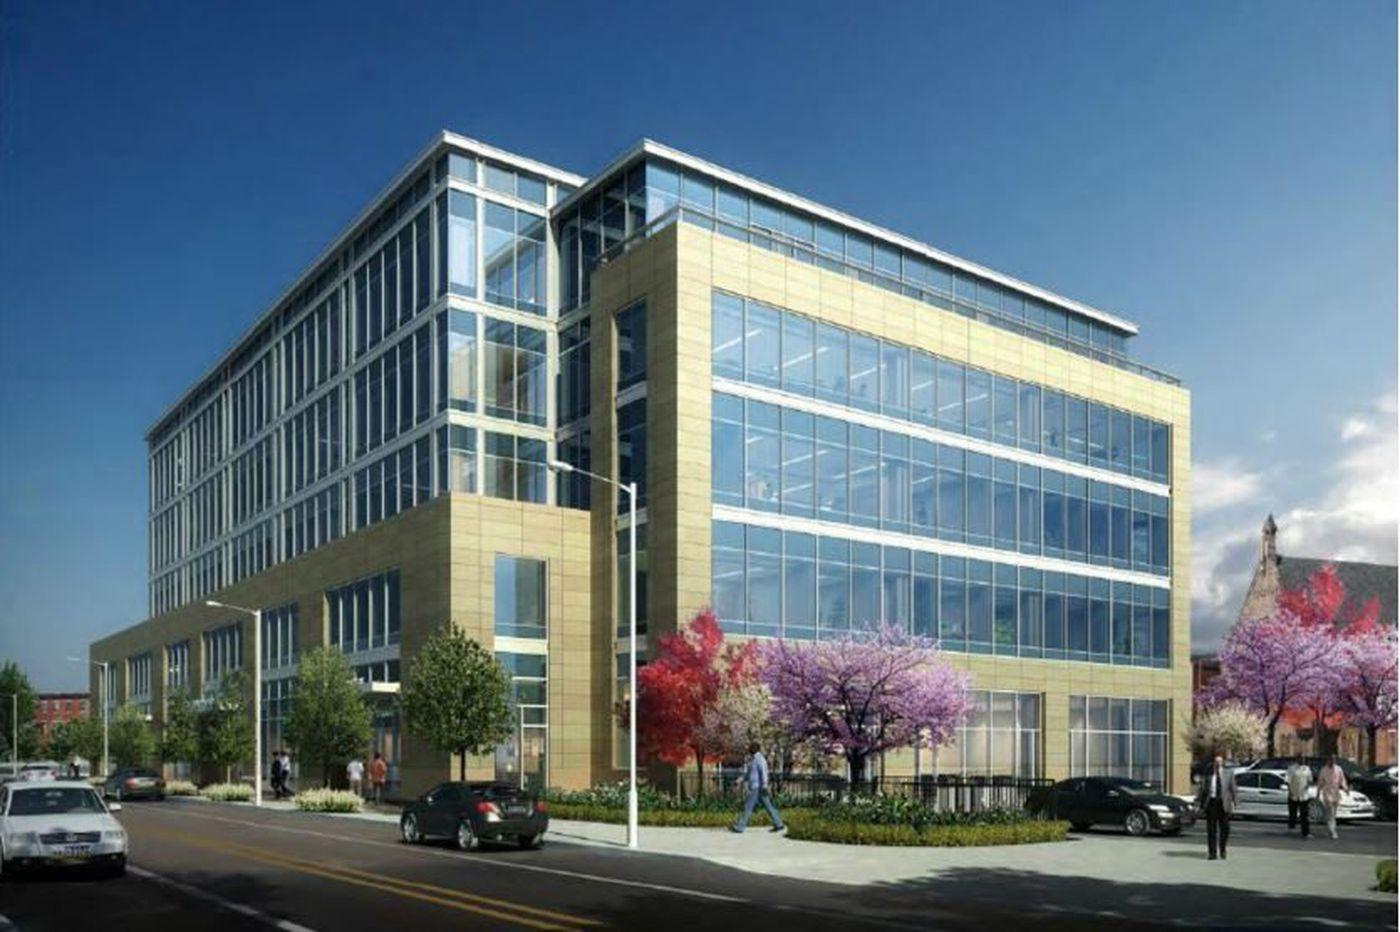 PHA breaks ground on $45M N. Philly headquarters